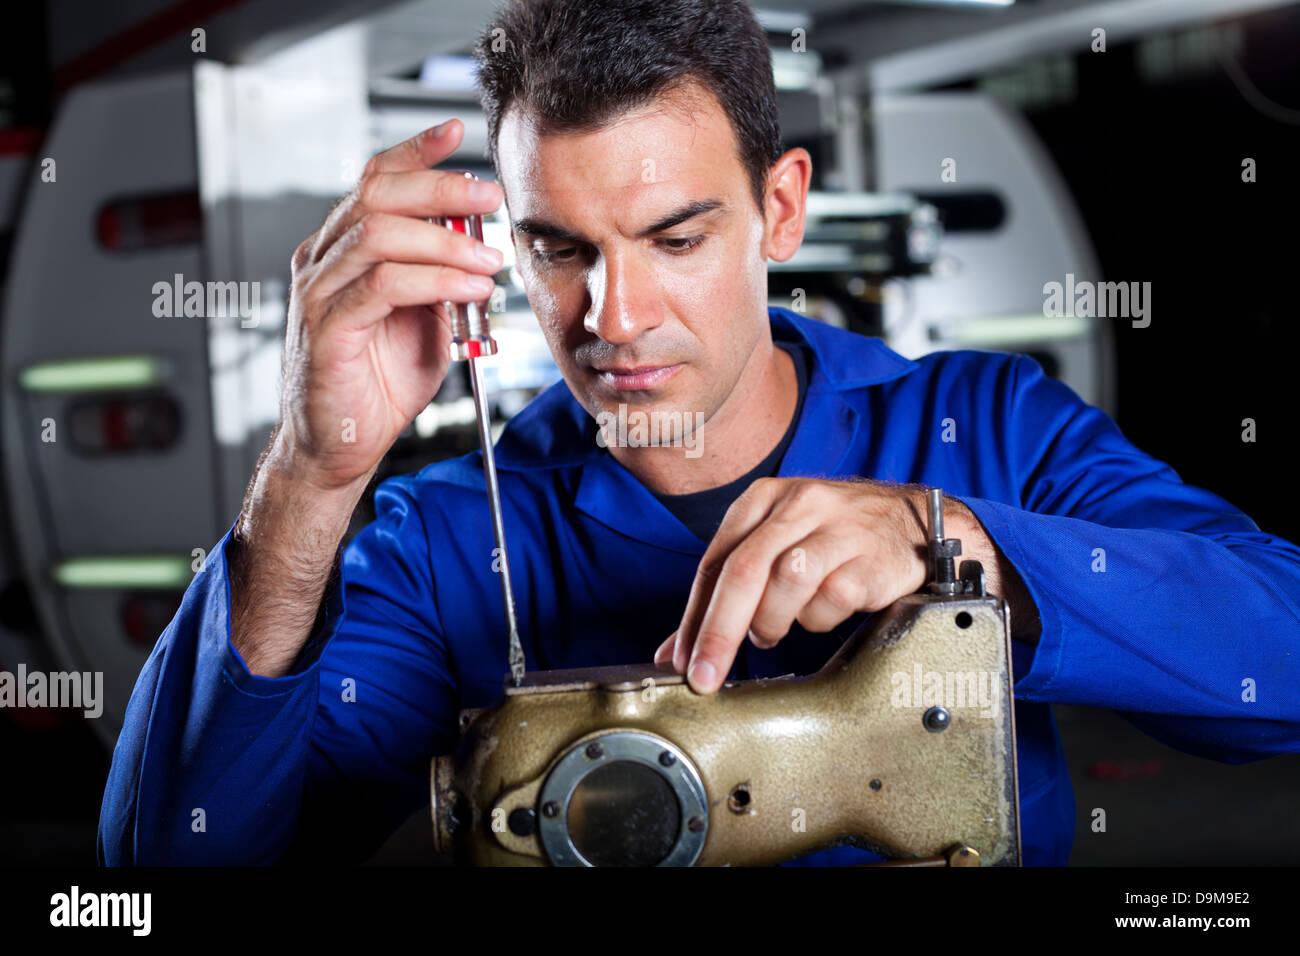 skilled mechanic repairing industrial sewing machine in factory - Stock Image